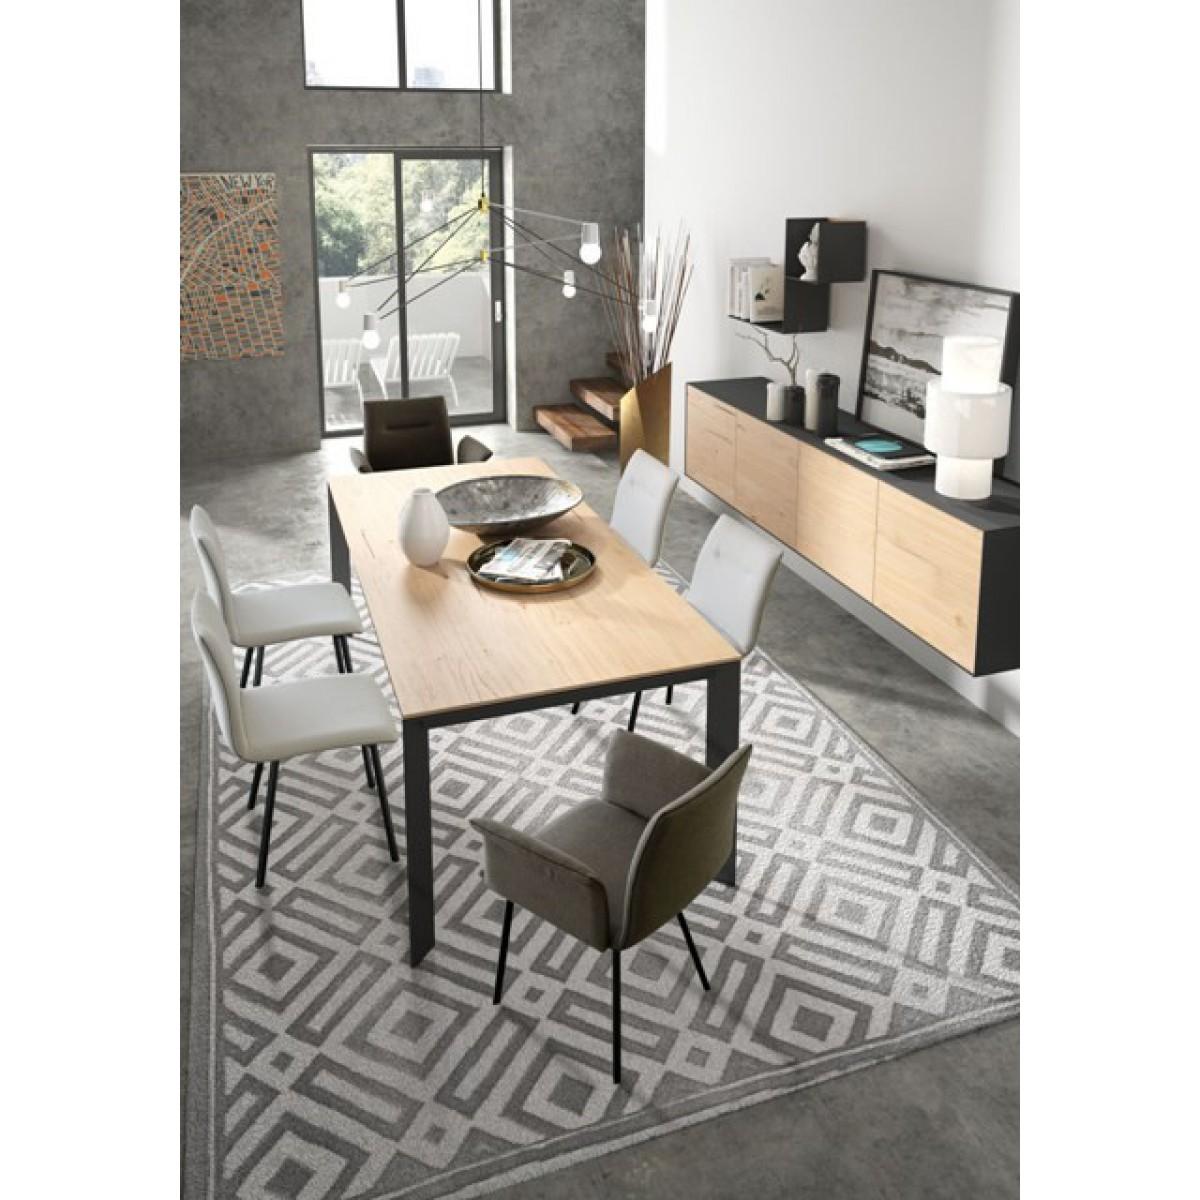 lowboard-tv-dressoir-brooklyn-mintjens-eiken-zwart-metaal-hangend-BR6_S2-miltonhouse